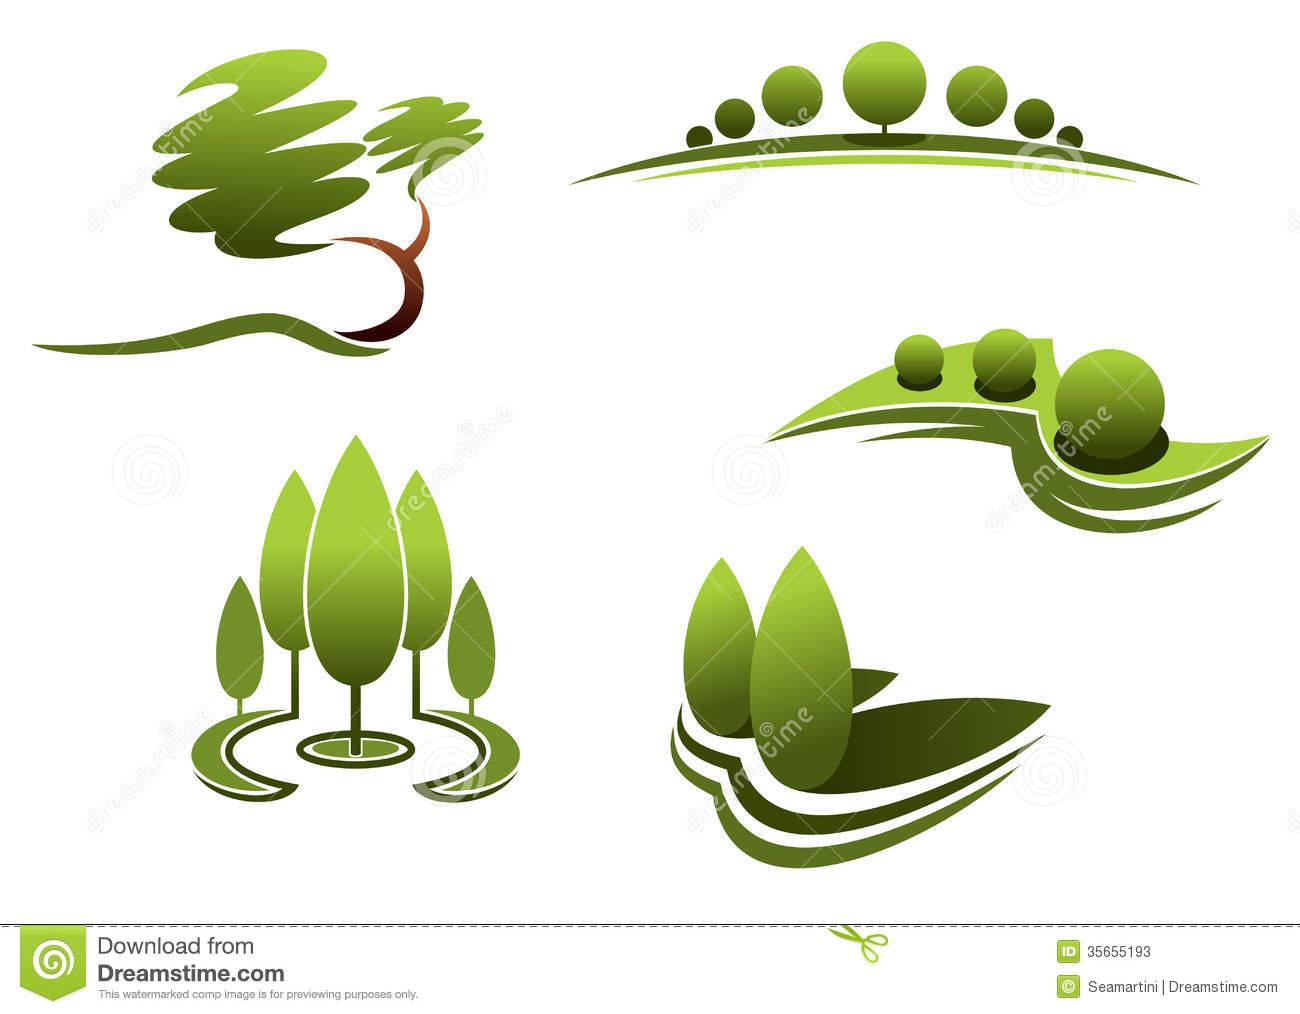 Palm leaf outline clipart